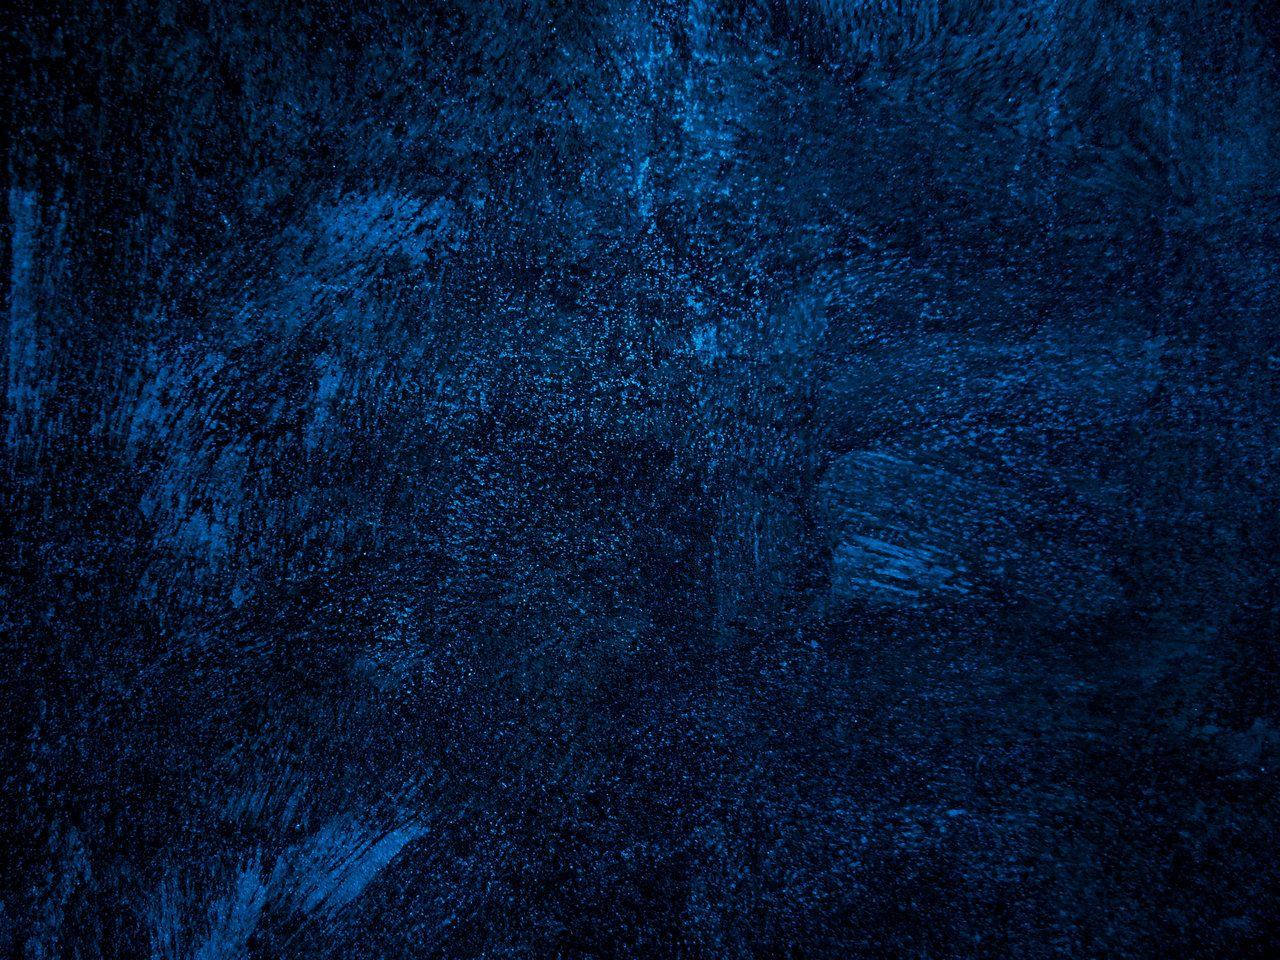 Royal Blue Rachel Mcadams Blue Background Wallpapers